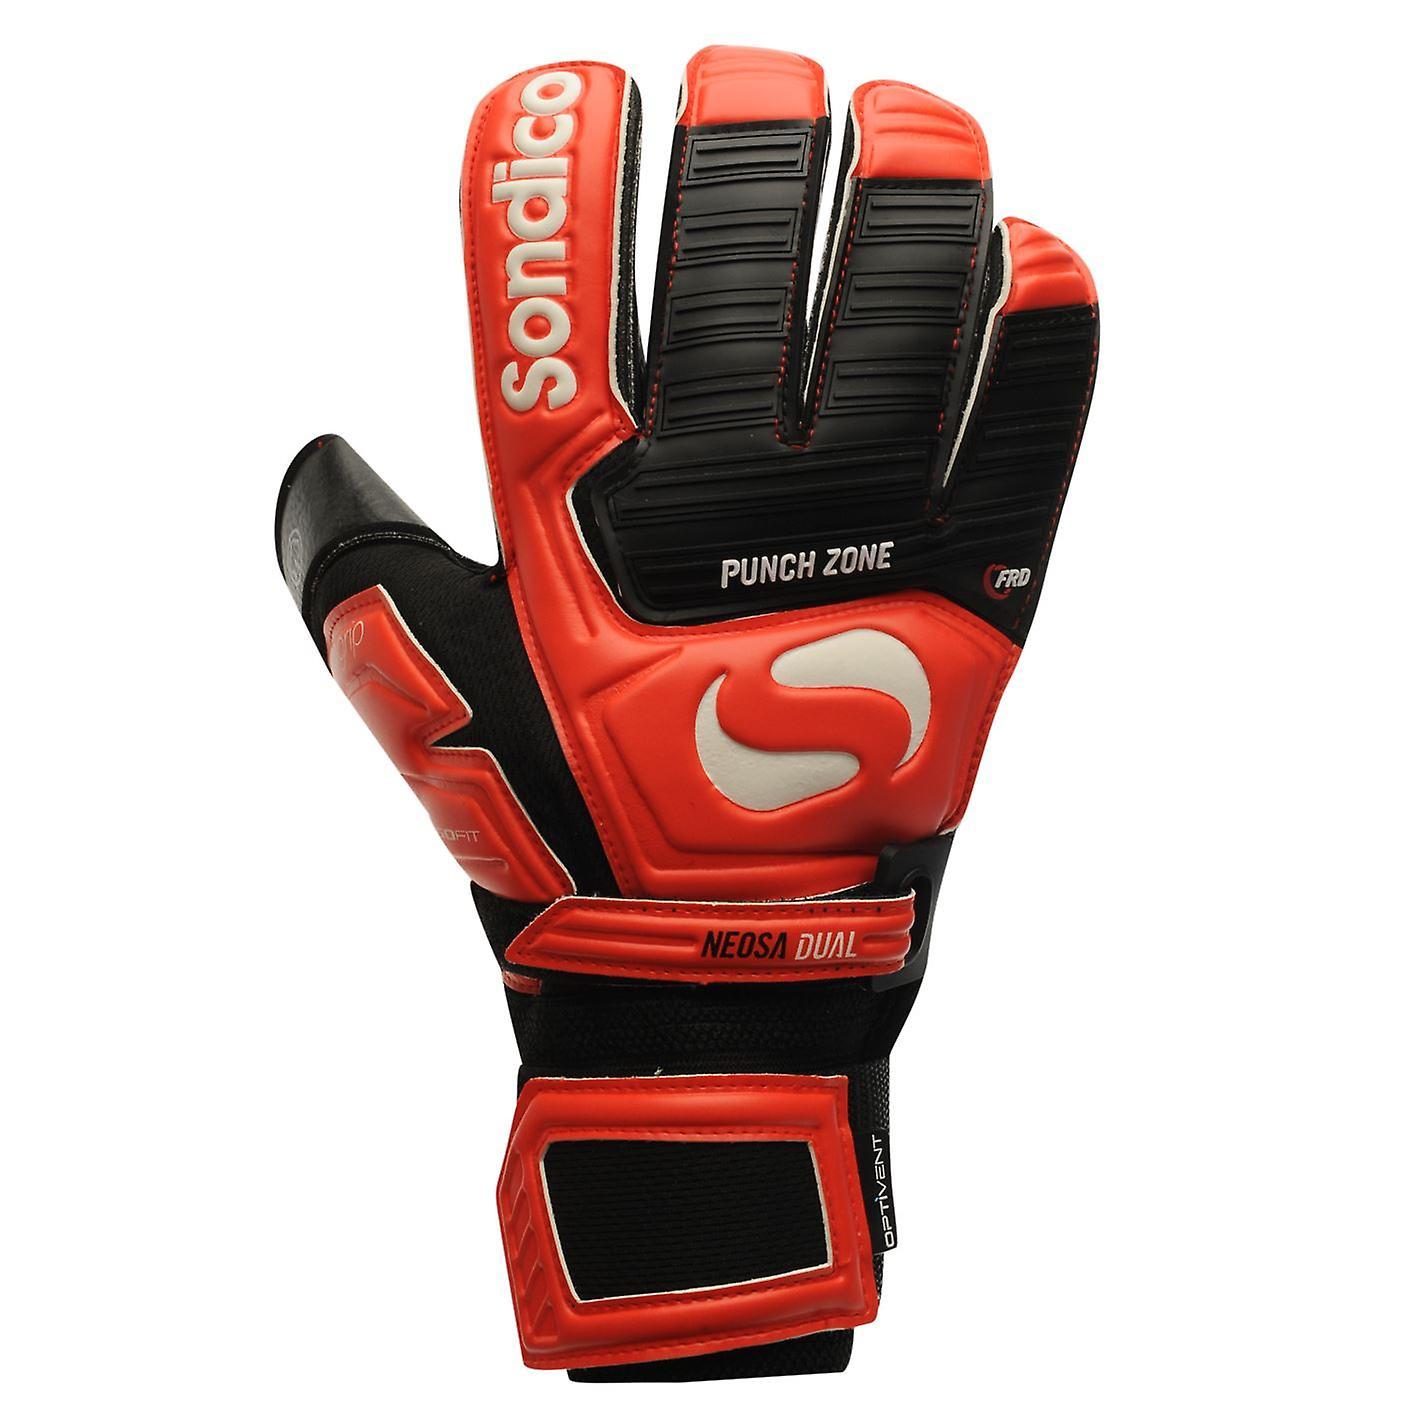 0f54e451bb9 Sondico Mens Neosa Dual Goalkeeper Gloves Football Training Sports  Accessories